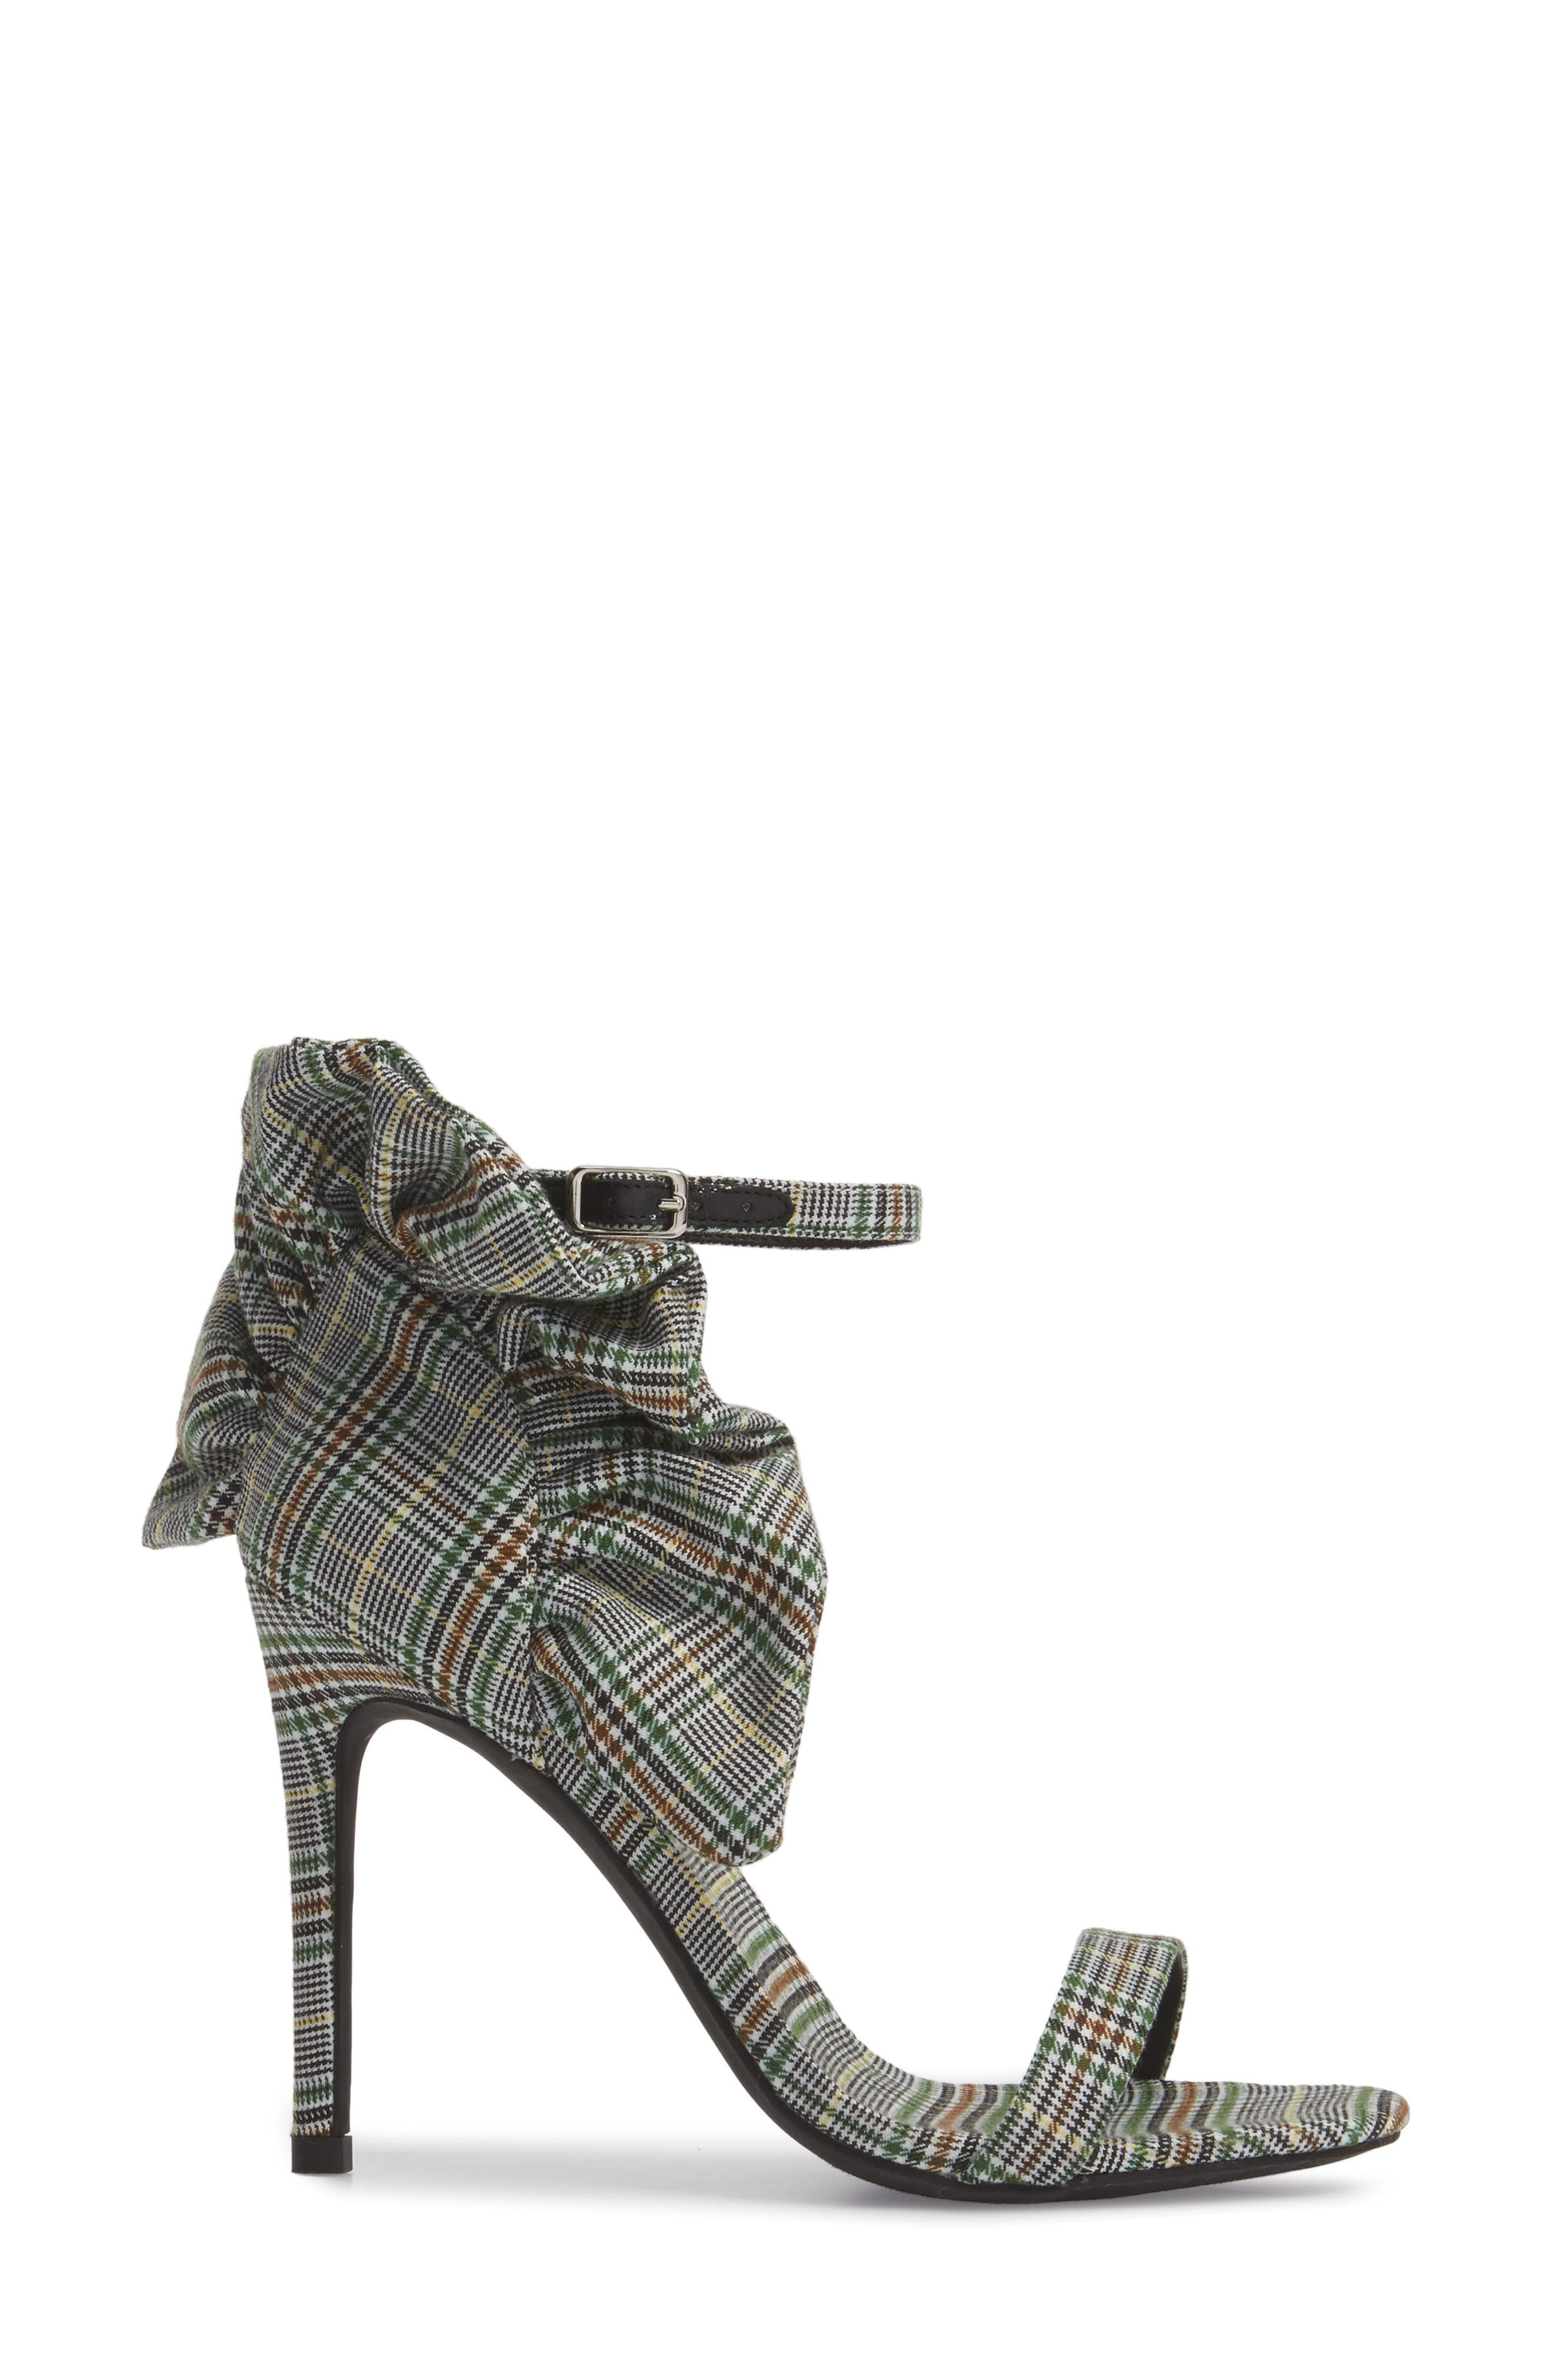 Cheshire Ruffle Sandal,                             Alternate thumbnail 6, color,                             Black/ White/ Green Fabric